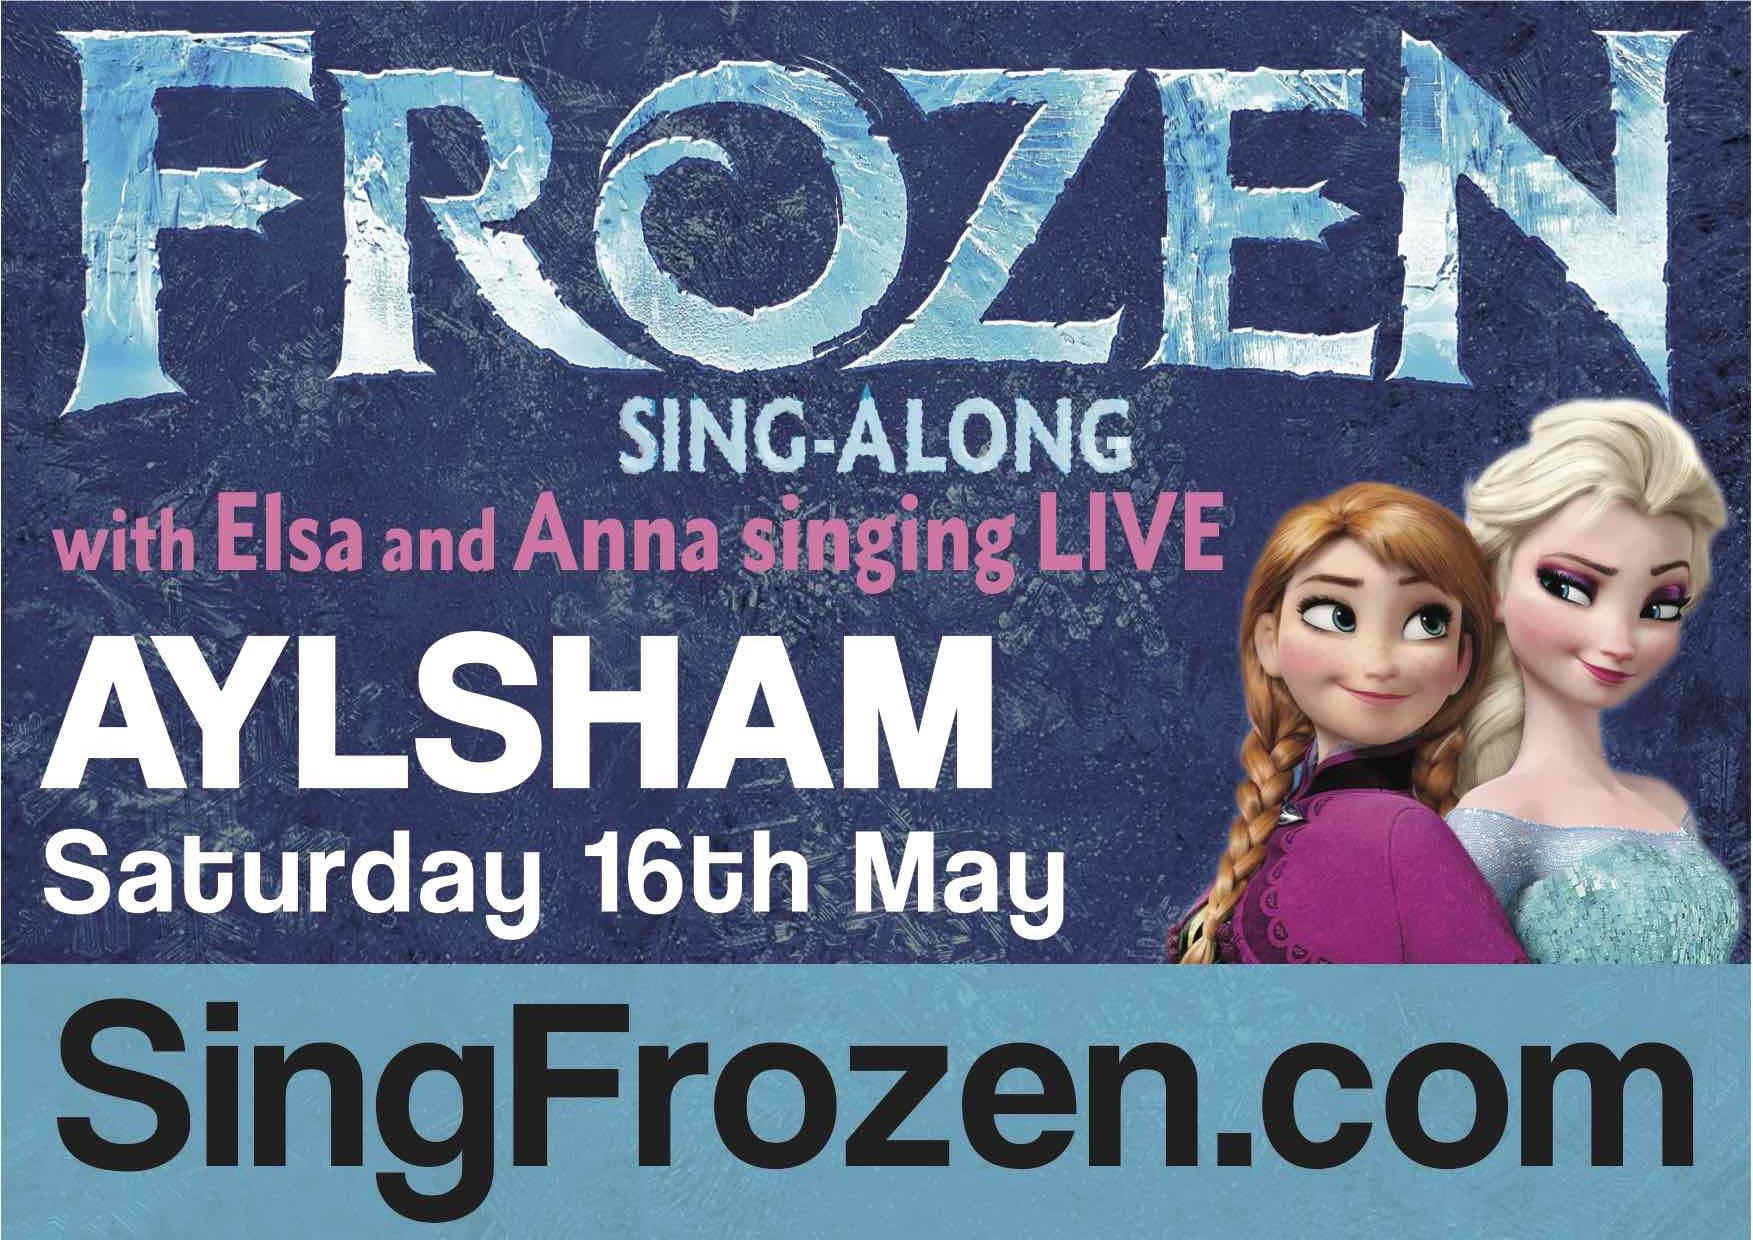 Frozen Board Aylsham iphoto